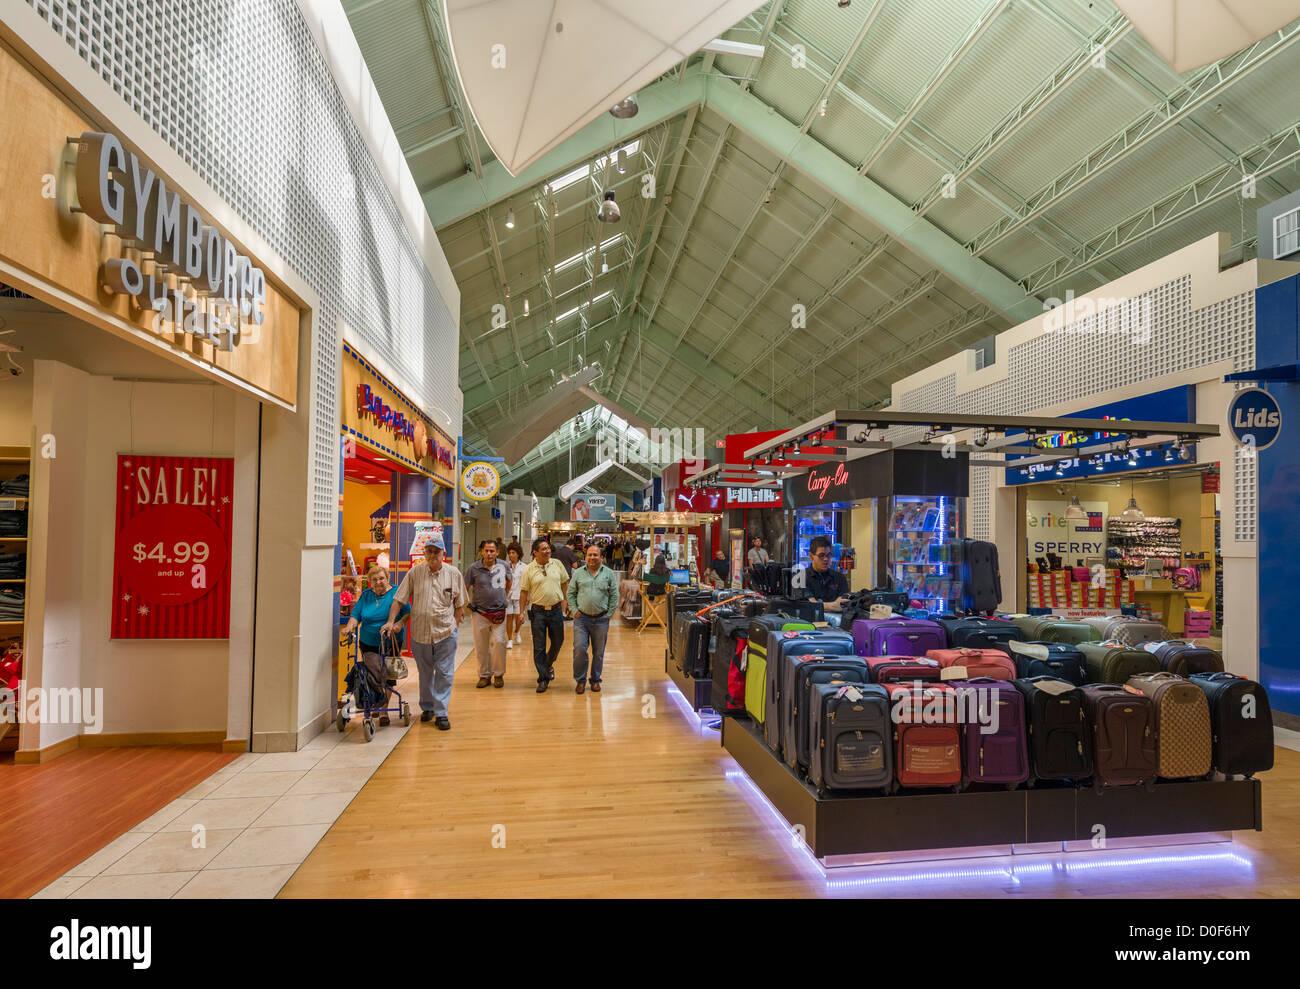 Interior of the Sawgrass Mills shopping mall, Sunrise, Broward County, Florida, USA - Stock Image